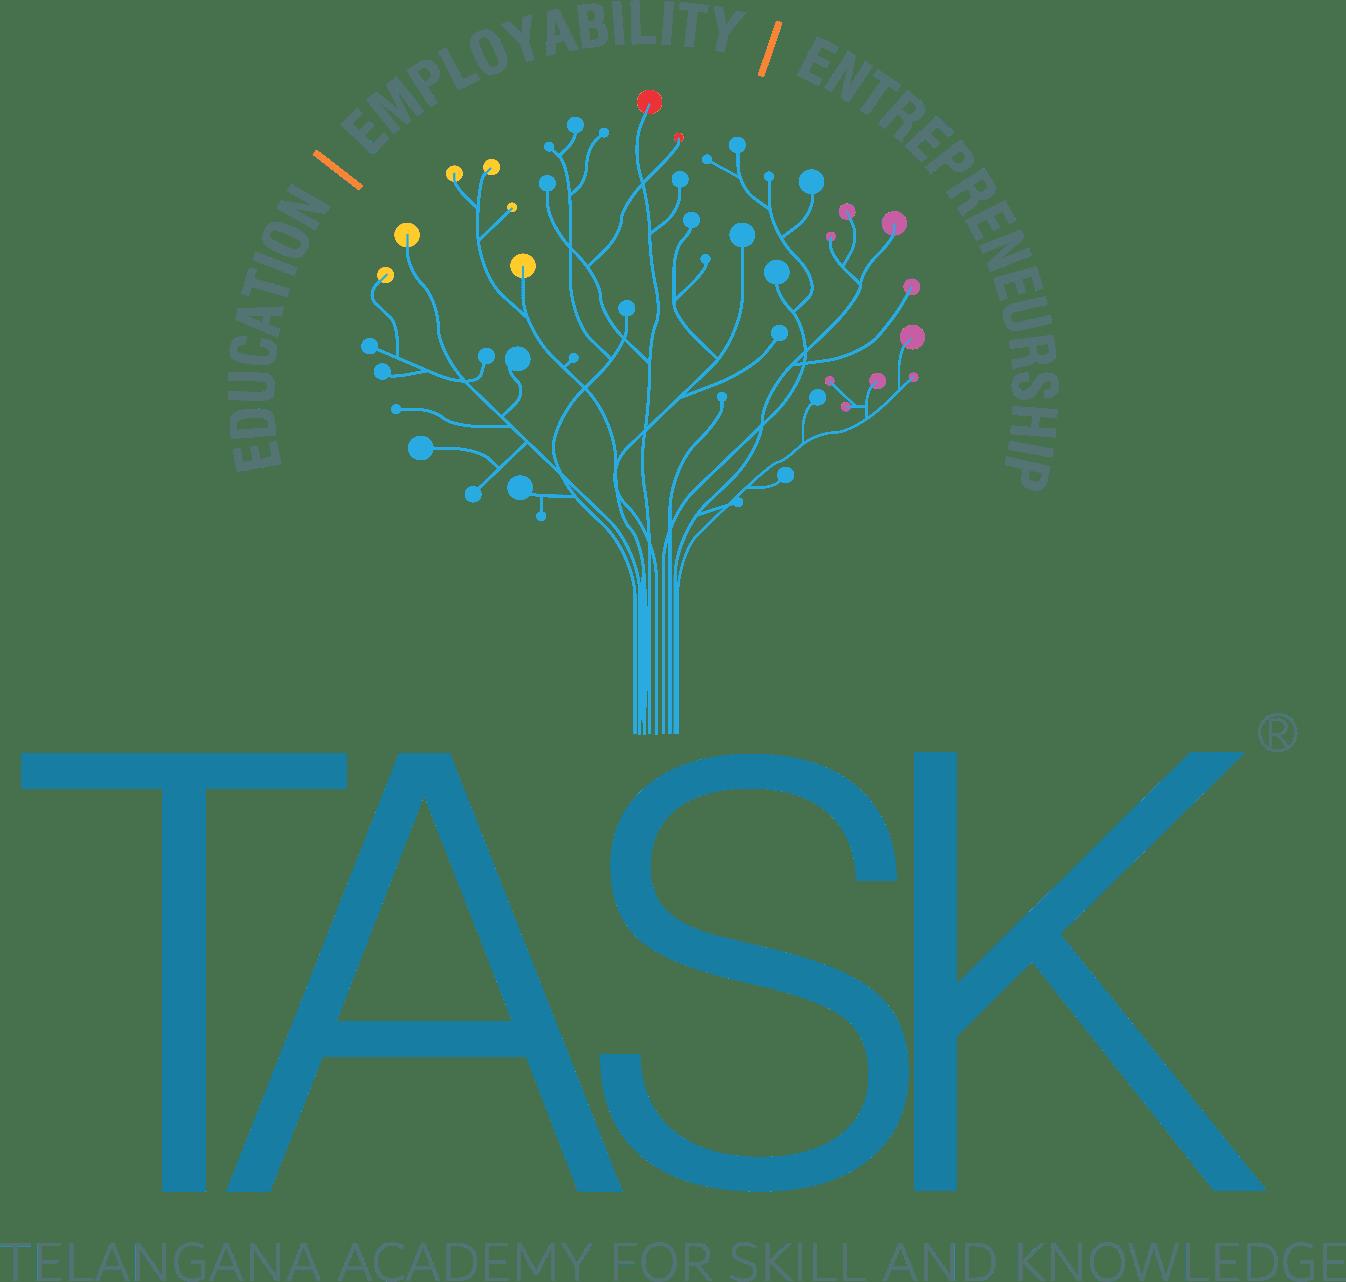 Ecosystem Partner - TASK